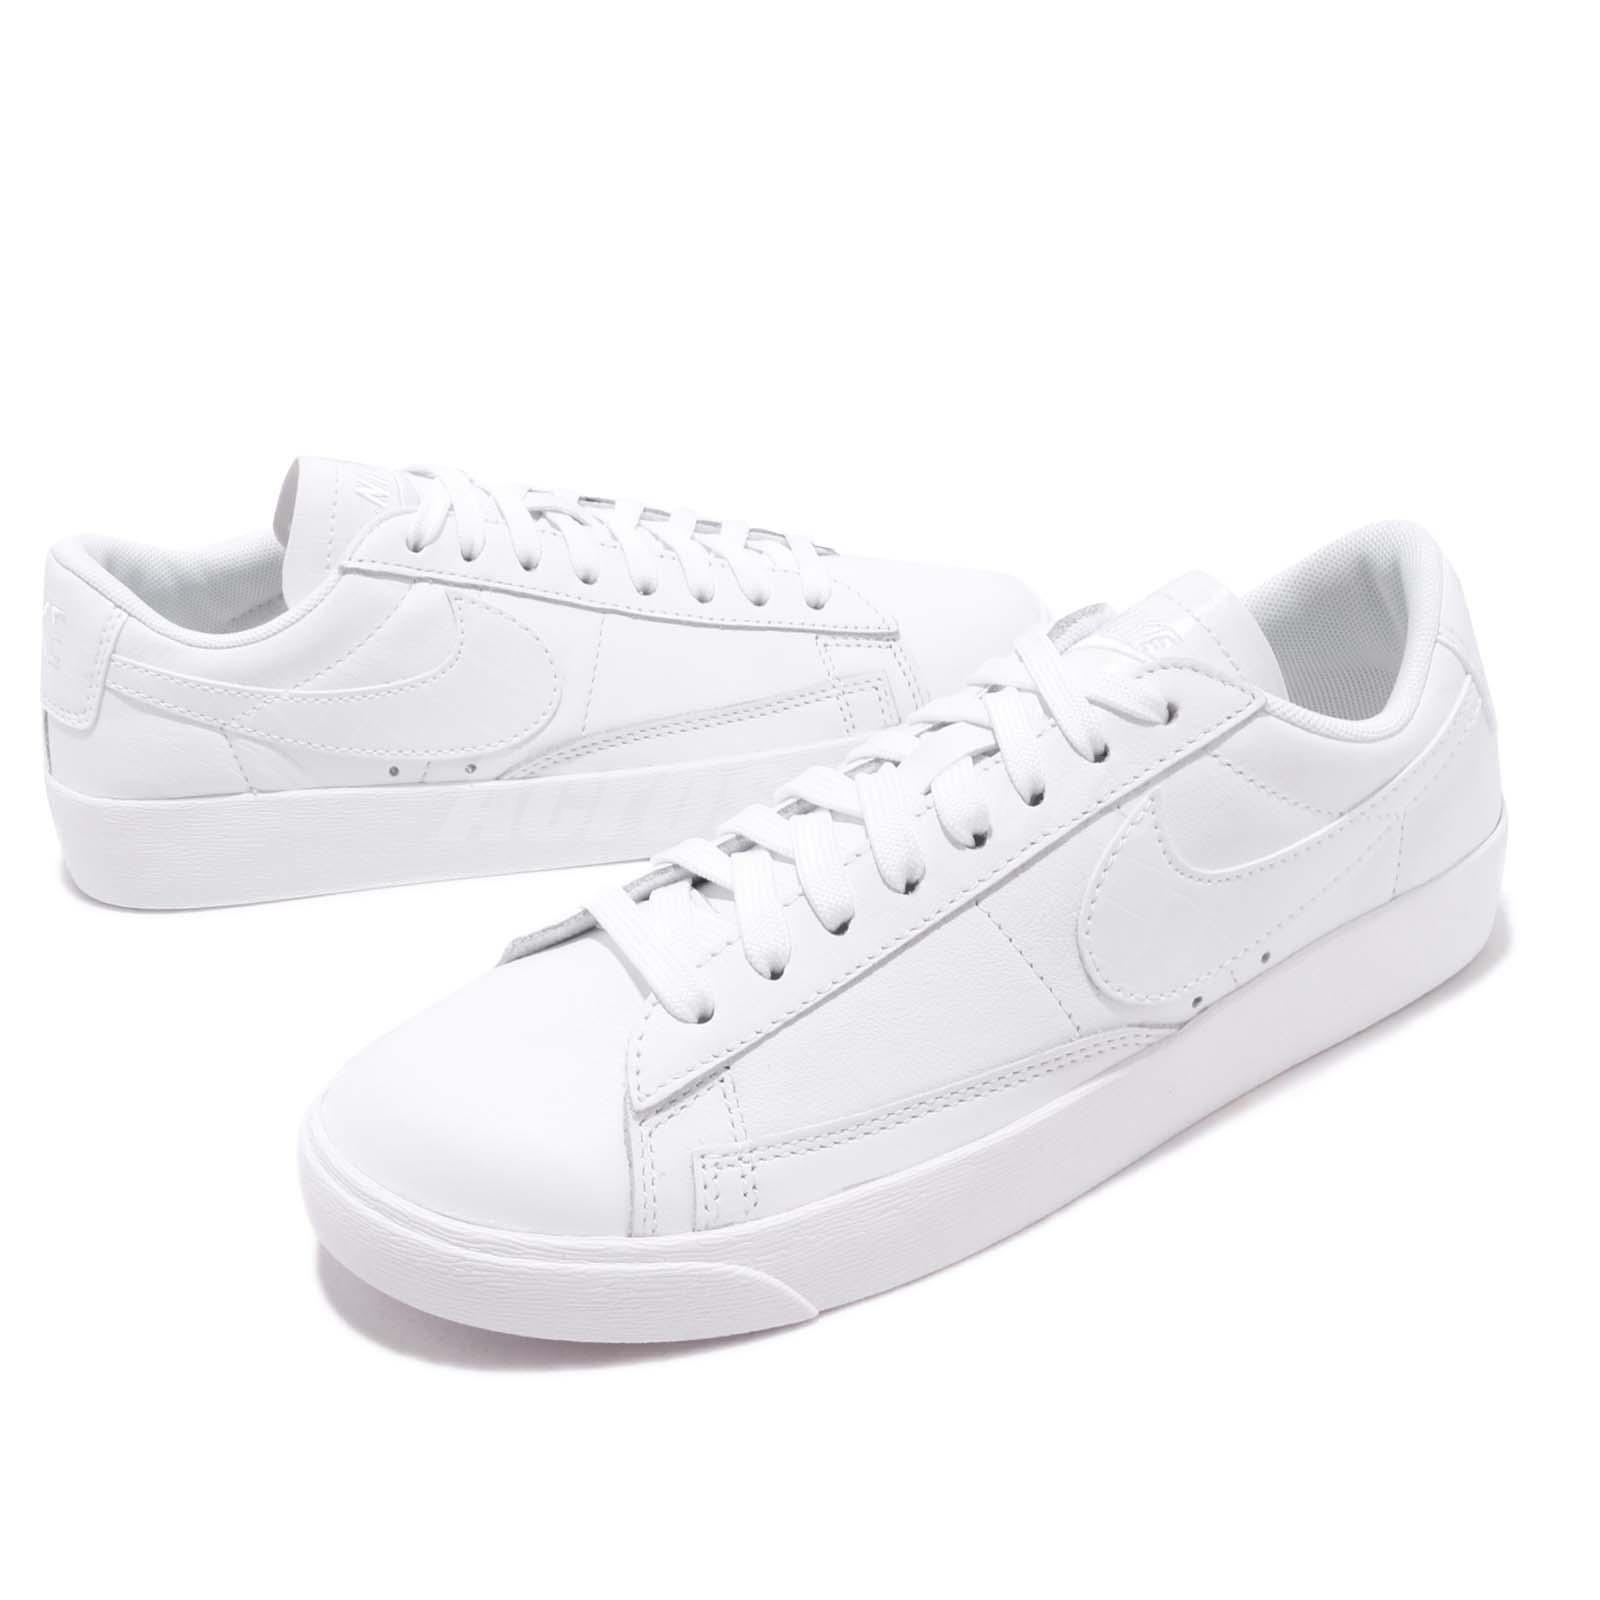 factory price f73a6 f9d9d Details about Nike Wmns Blazer Low Triple White Women Casual Shoes Sneakers  BQ0033-111